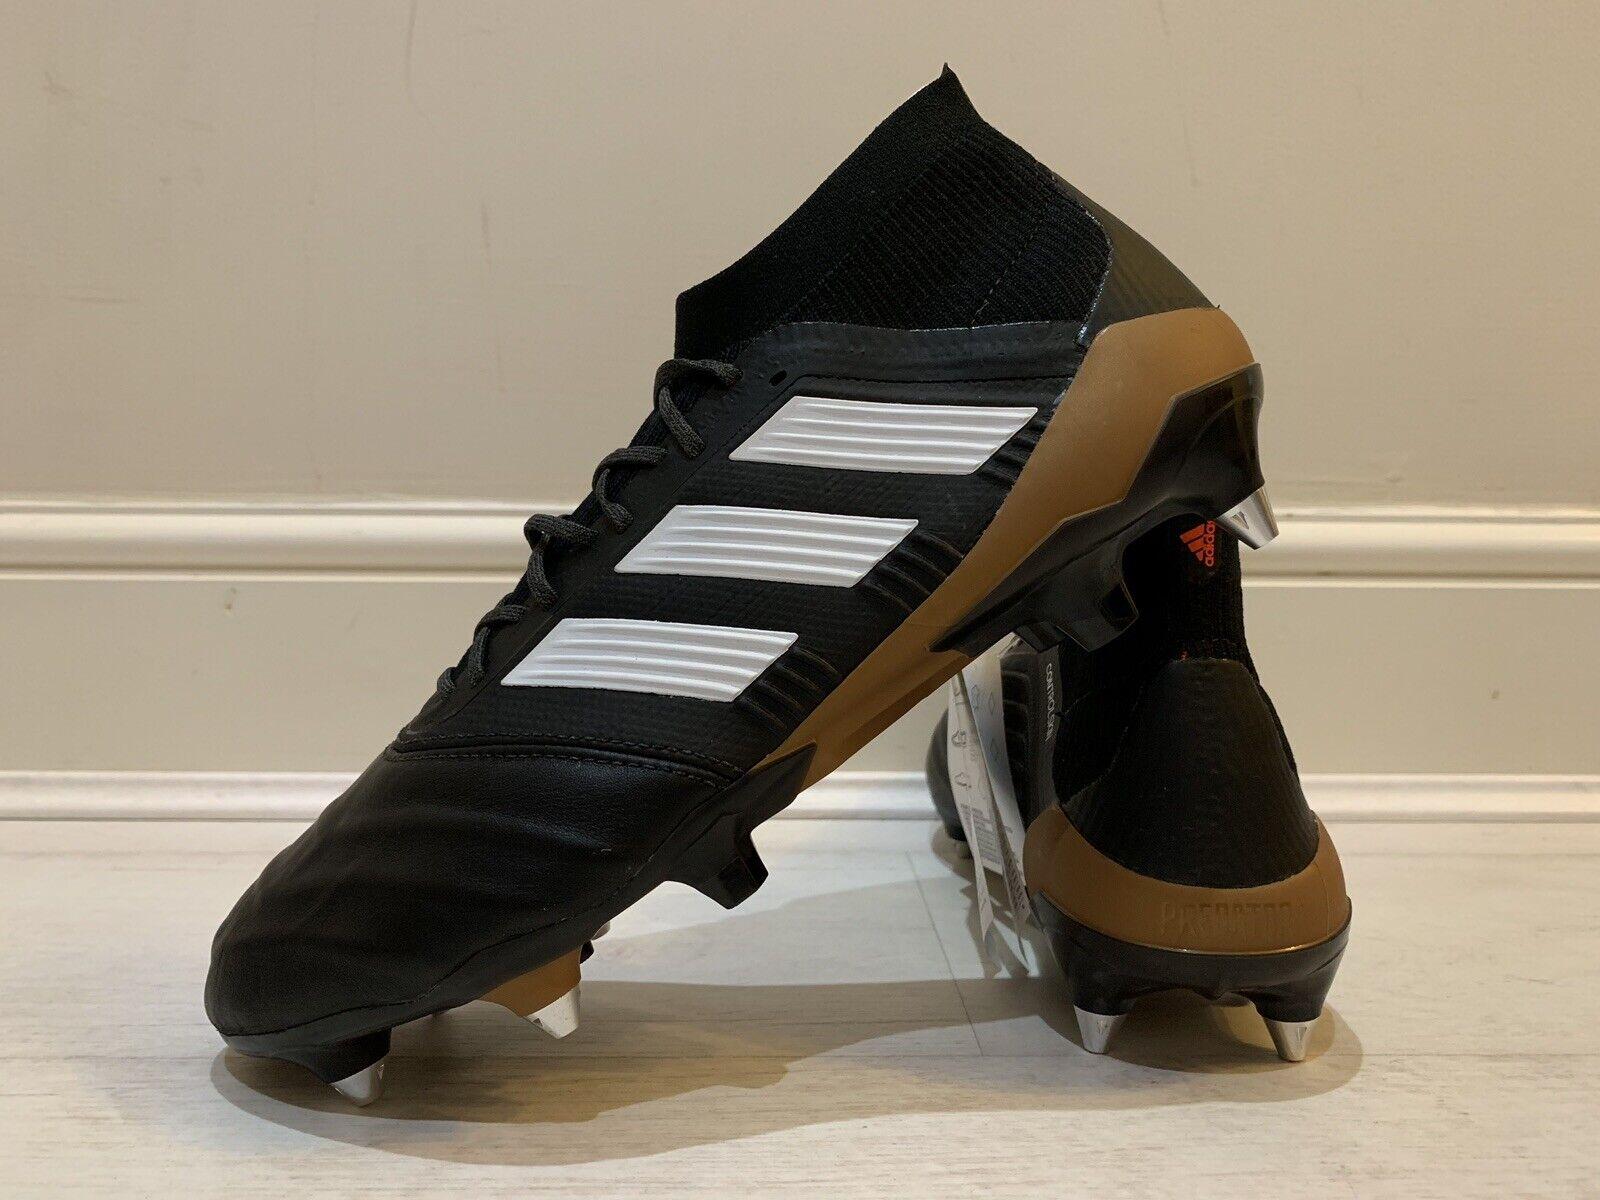 Adidas Protator 18.1 SG Football Stiefel (Pro Edition) Größe UK 10 Leather